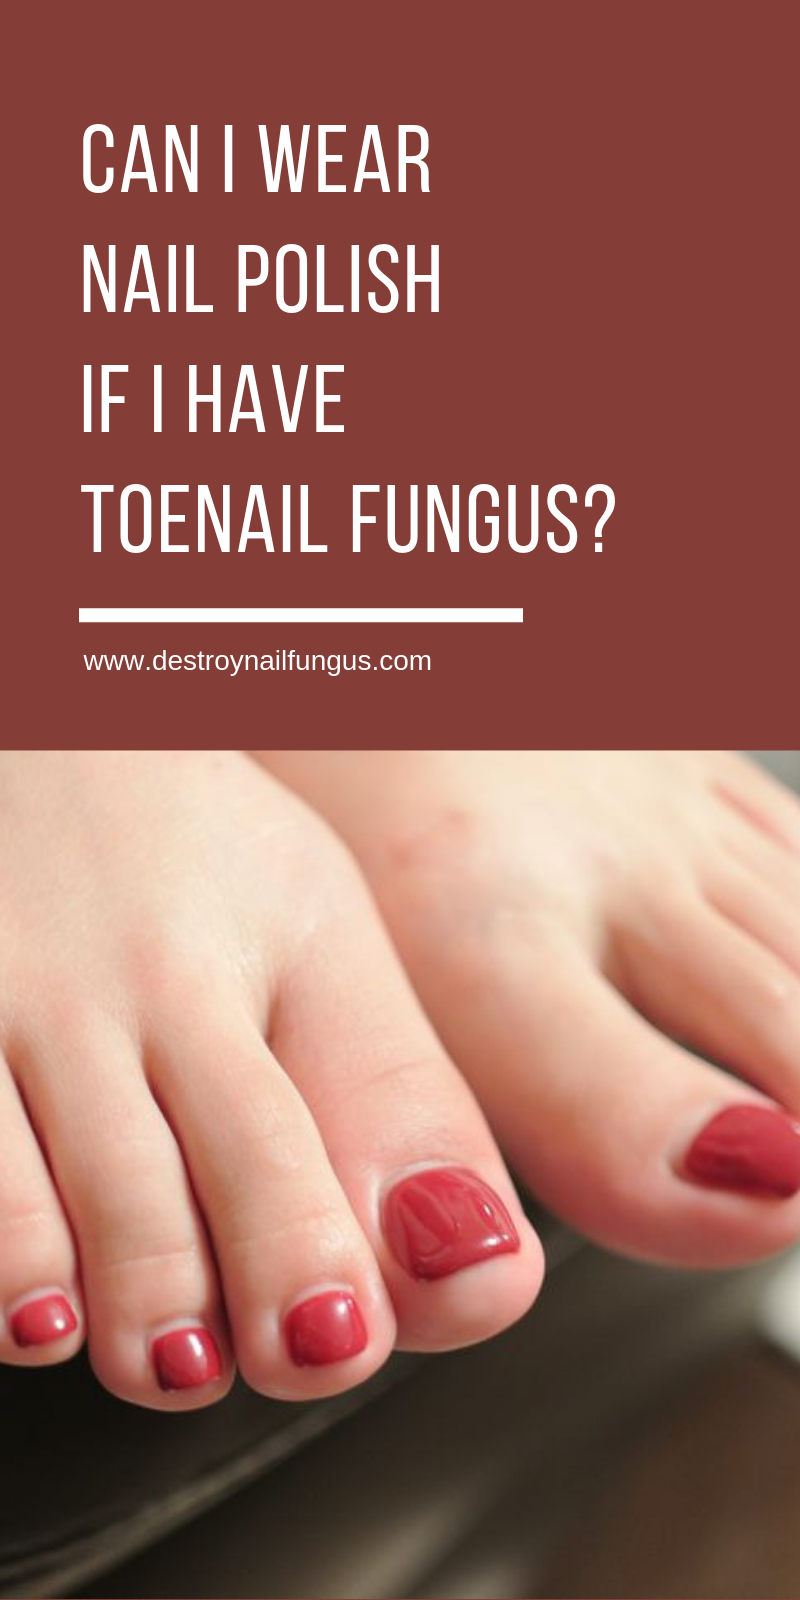 Can I Wear Nail Polish If I Have Toenail Fungus Toenail Fungus Nail Fungus Treatment Toenail Fungus Remedies